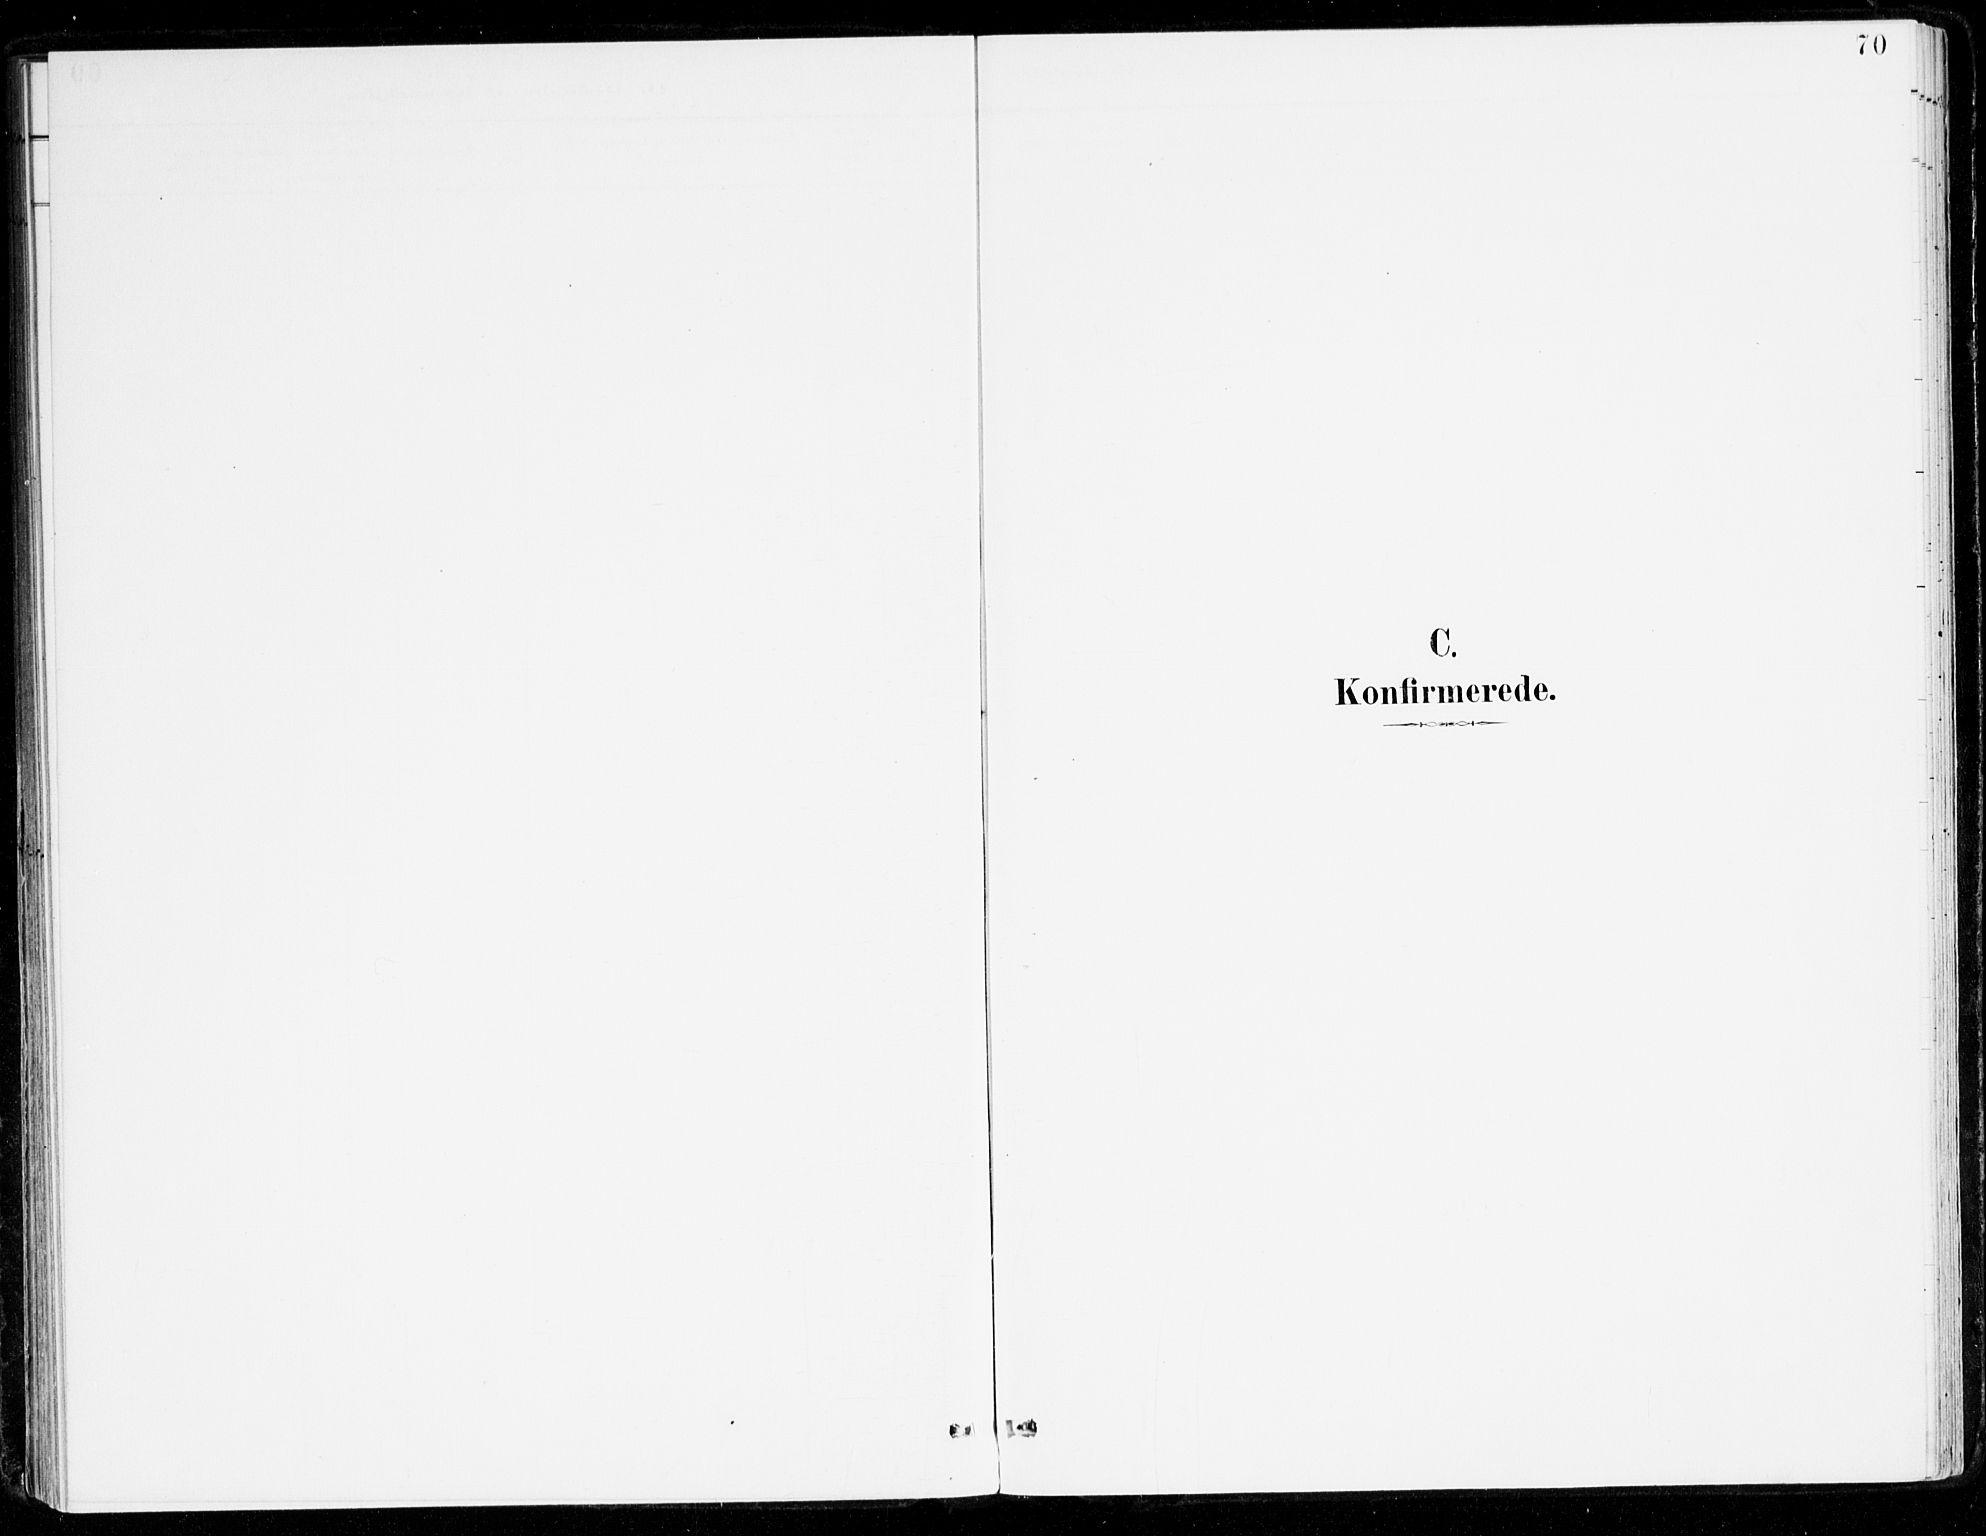 SAB, Leikanger Sokneprestembete, Ministerialbok nr. B 1, 1887-1922, s. 70